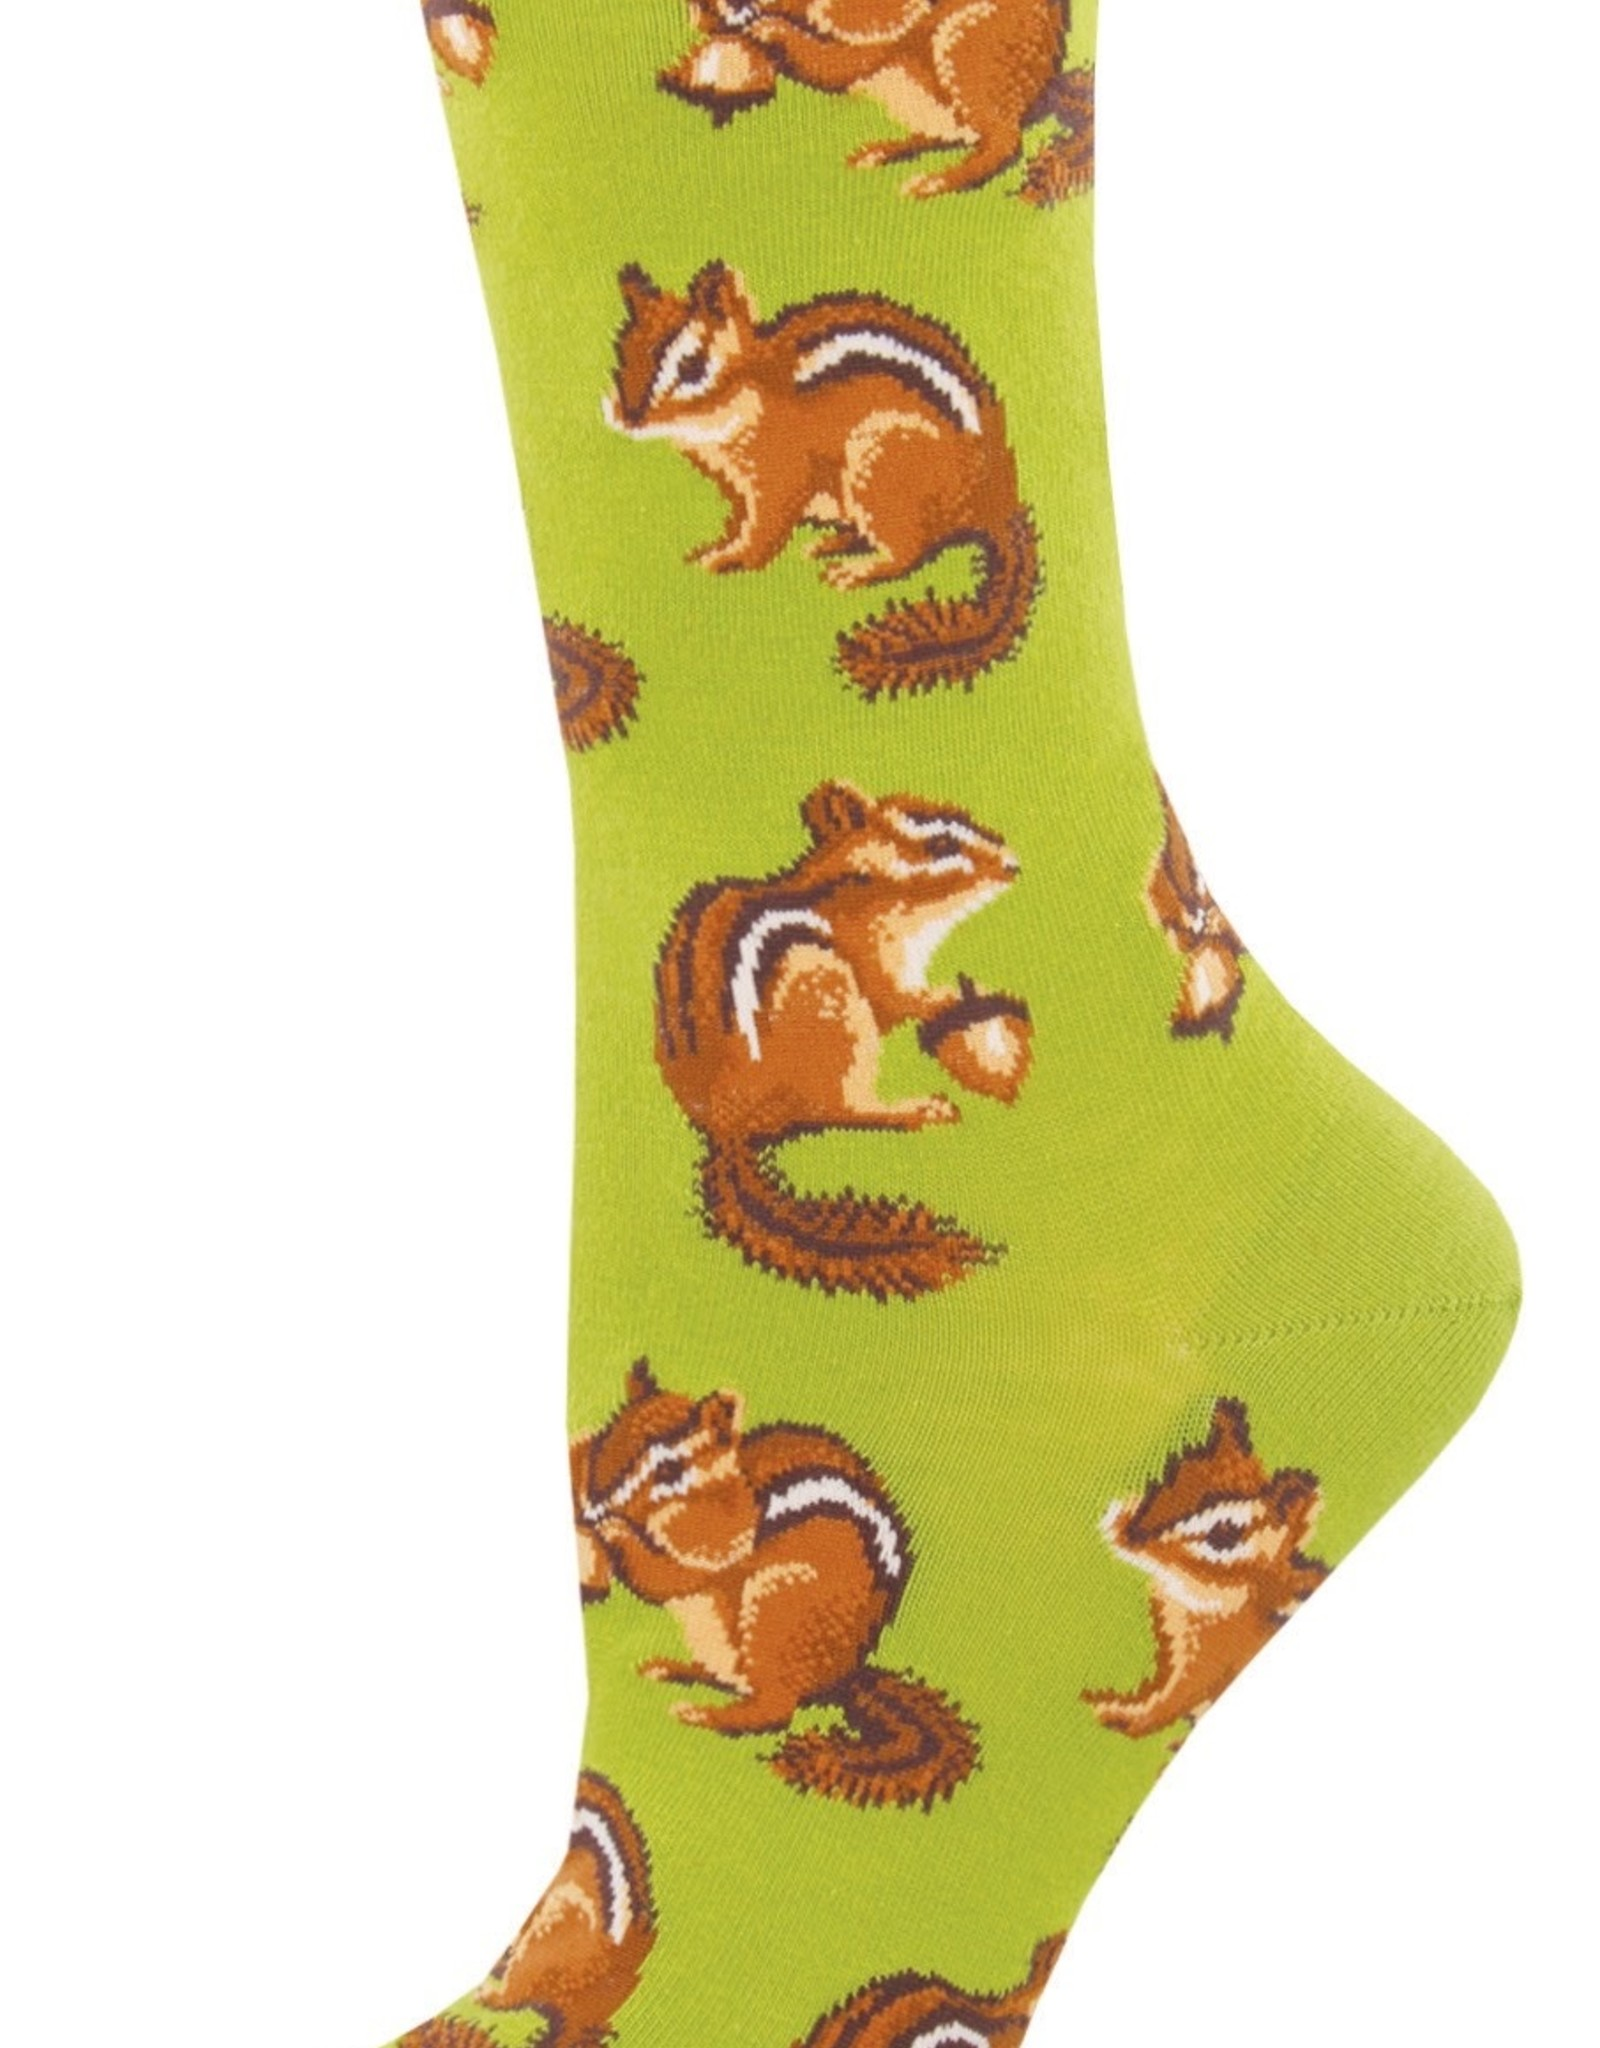 Sock Smith Chipmunk Cheeks green socks